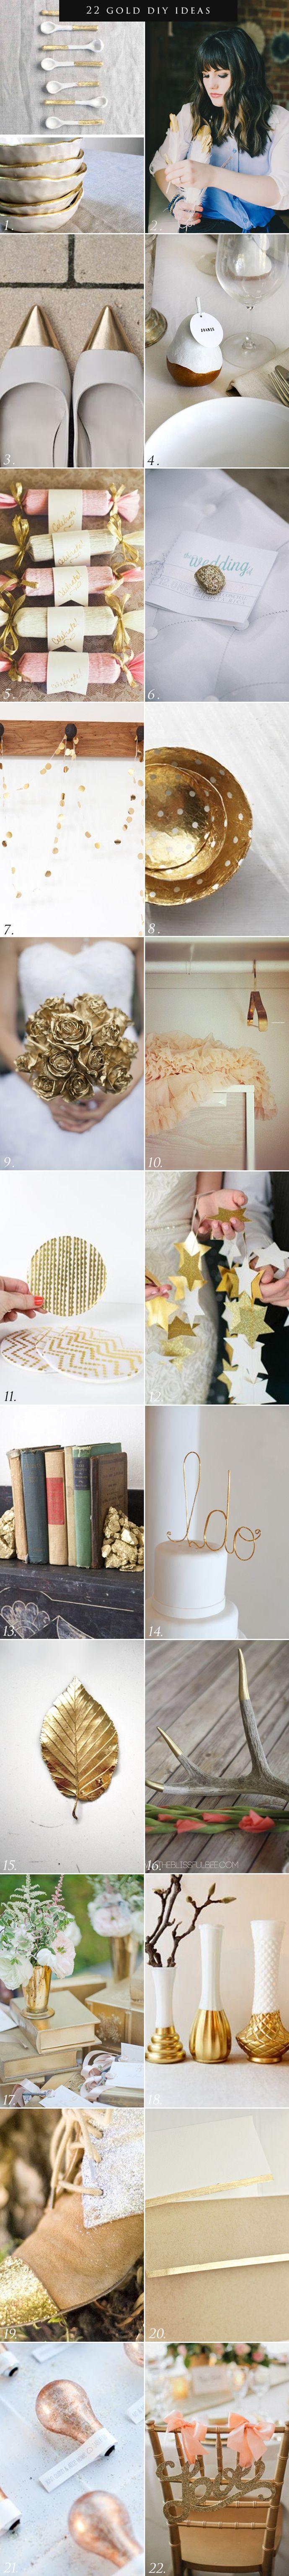 22 Gold Inspired DIY Wedding Ideas